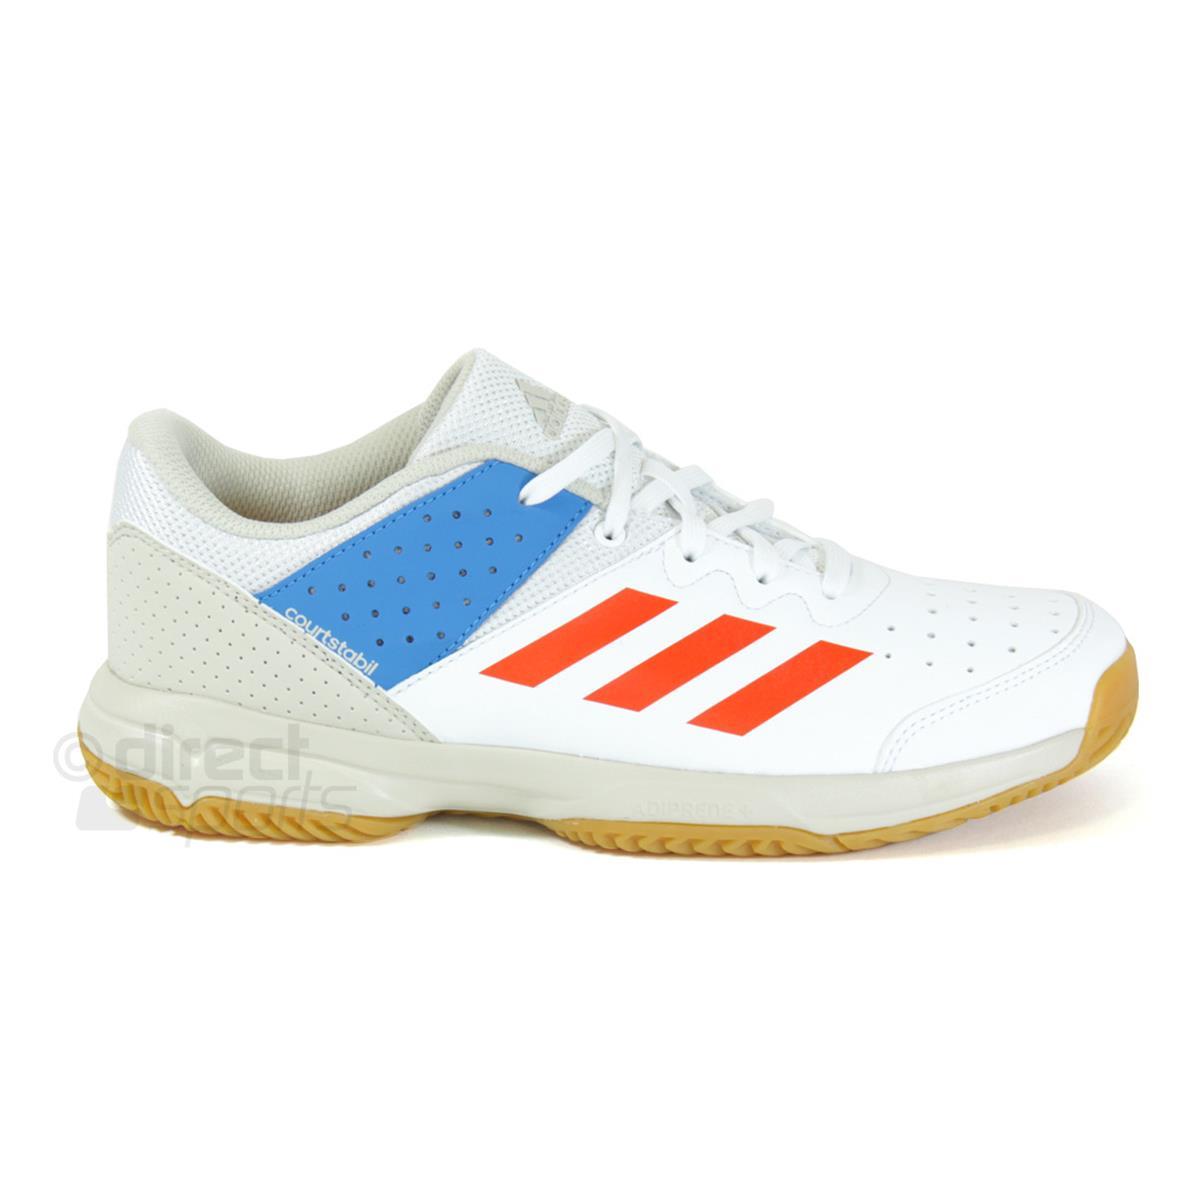 adidas Court Stabil Junior Court Shoes (White Orange) | Direct Squash